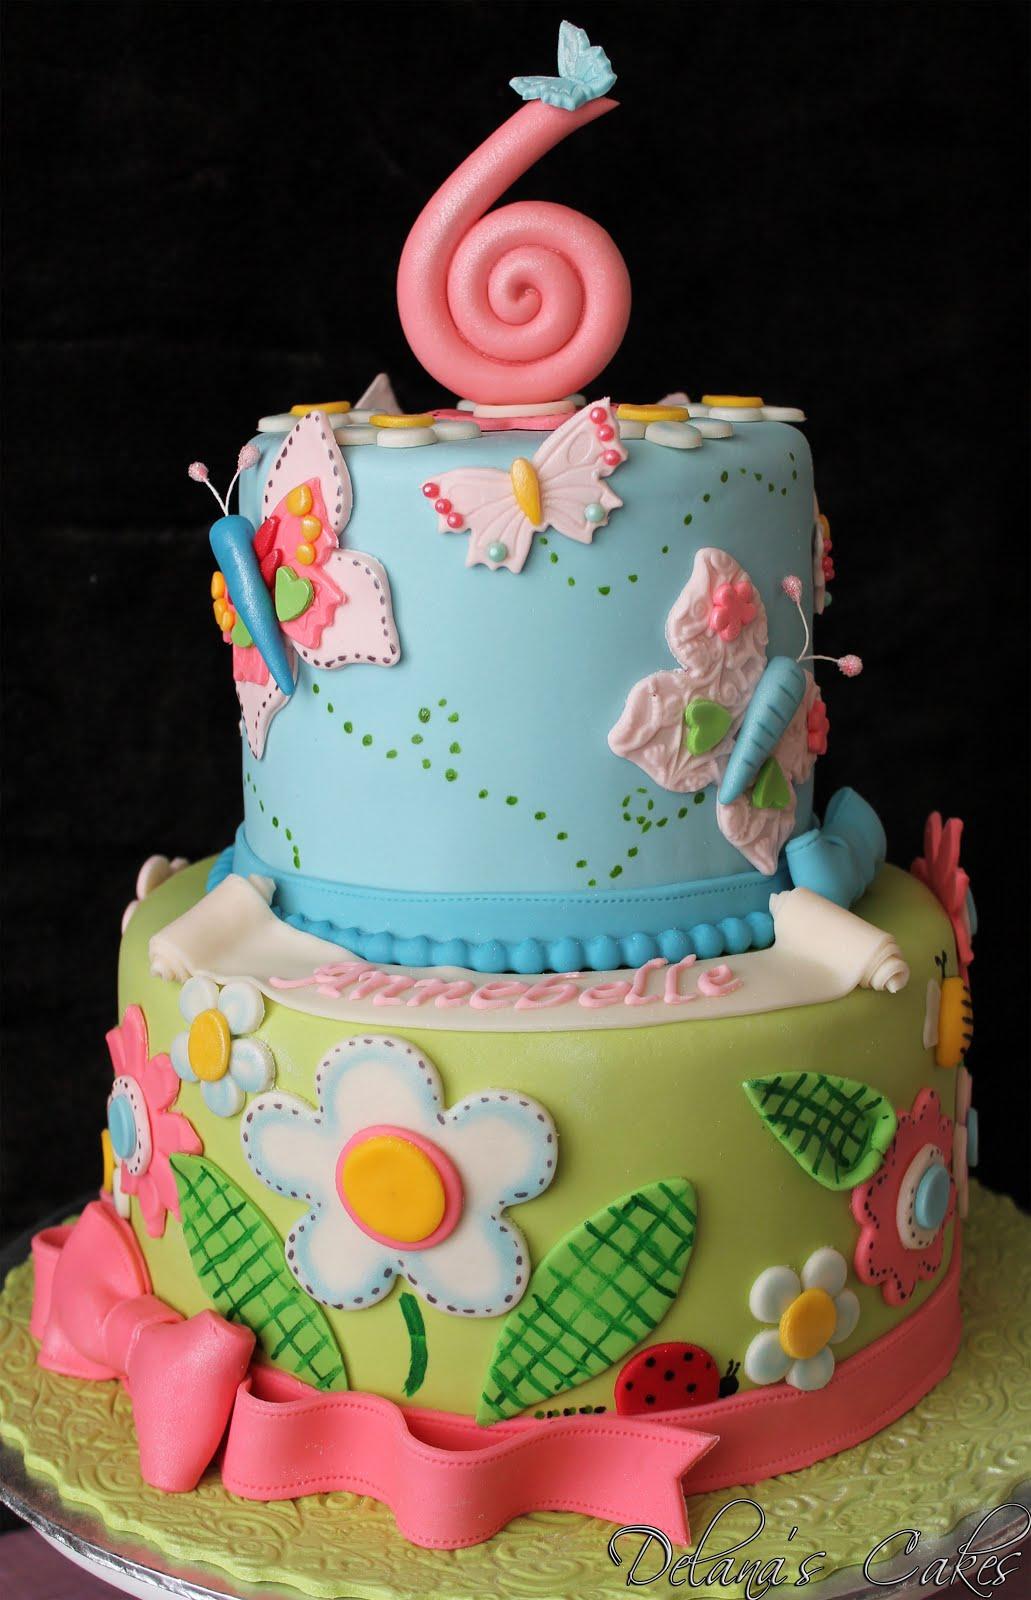 Delanas cakes flower garden cake flower garden cake izmirmasajfo